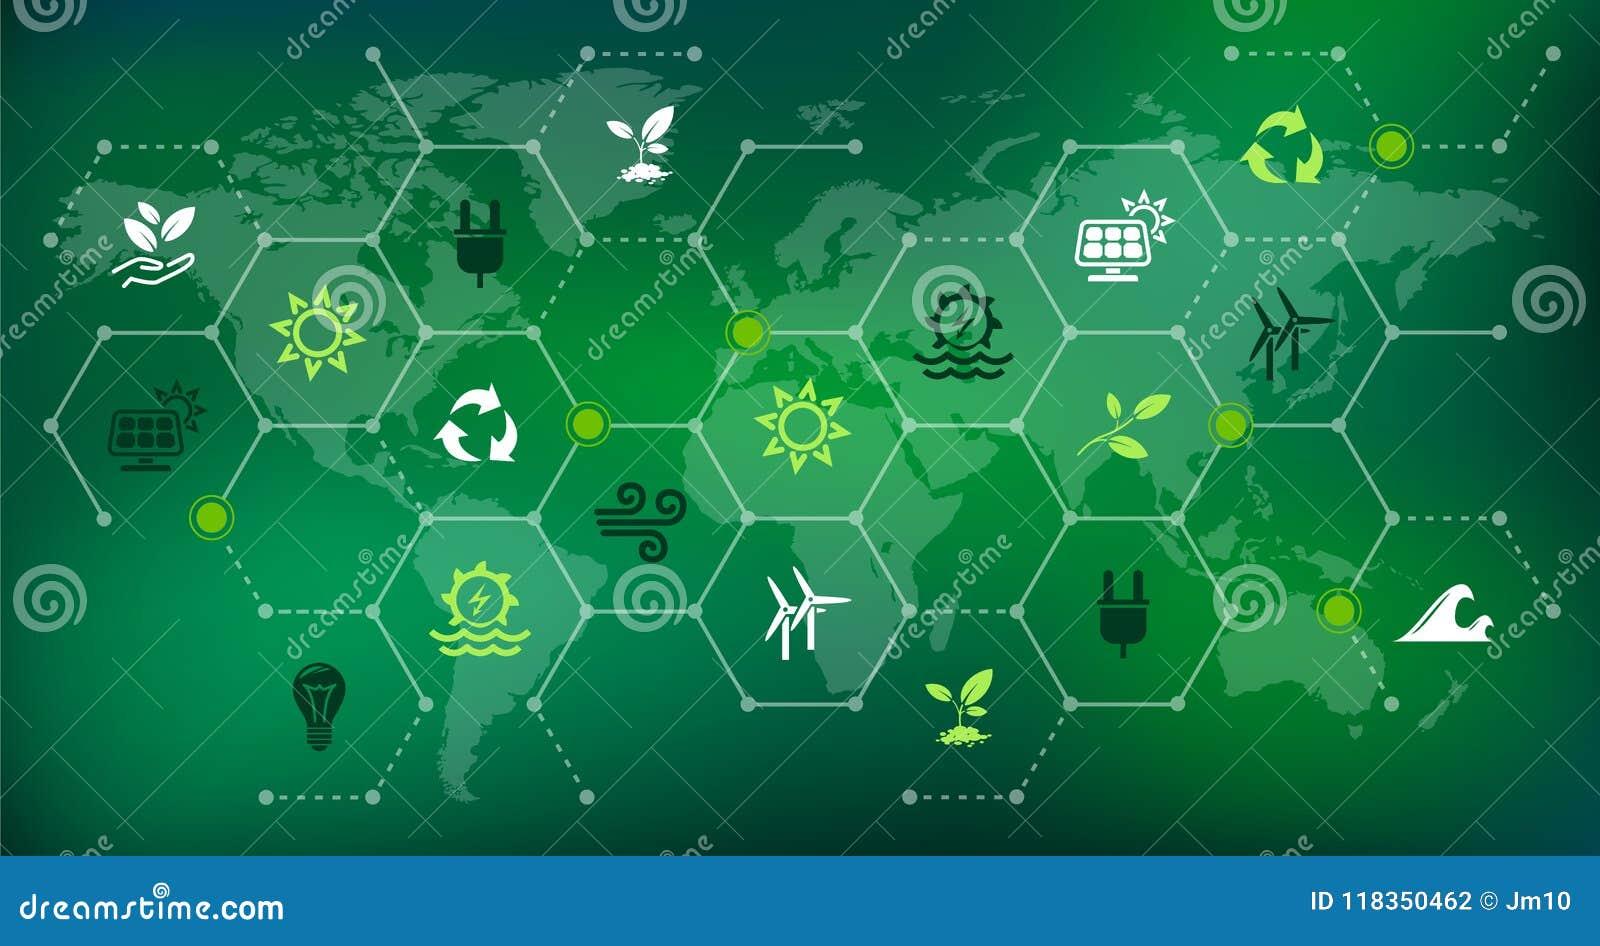 Vernieuwbare & duurzame energiebronnen - water, zonne, wind, biomassaenergie: illustratie